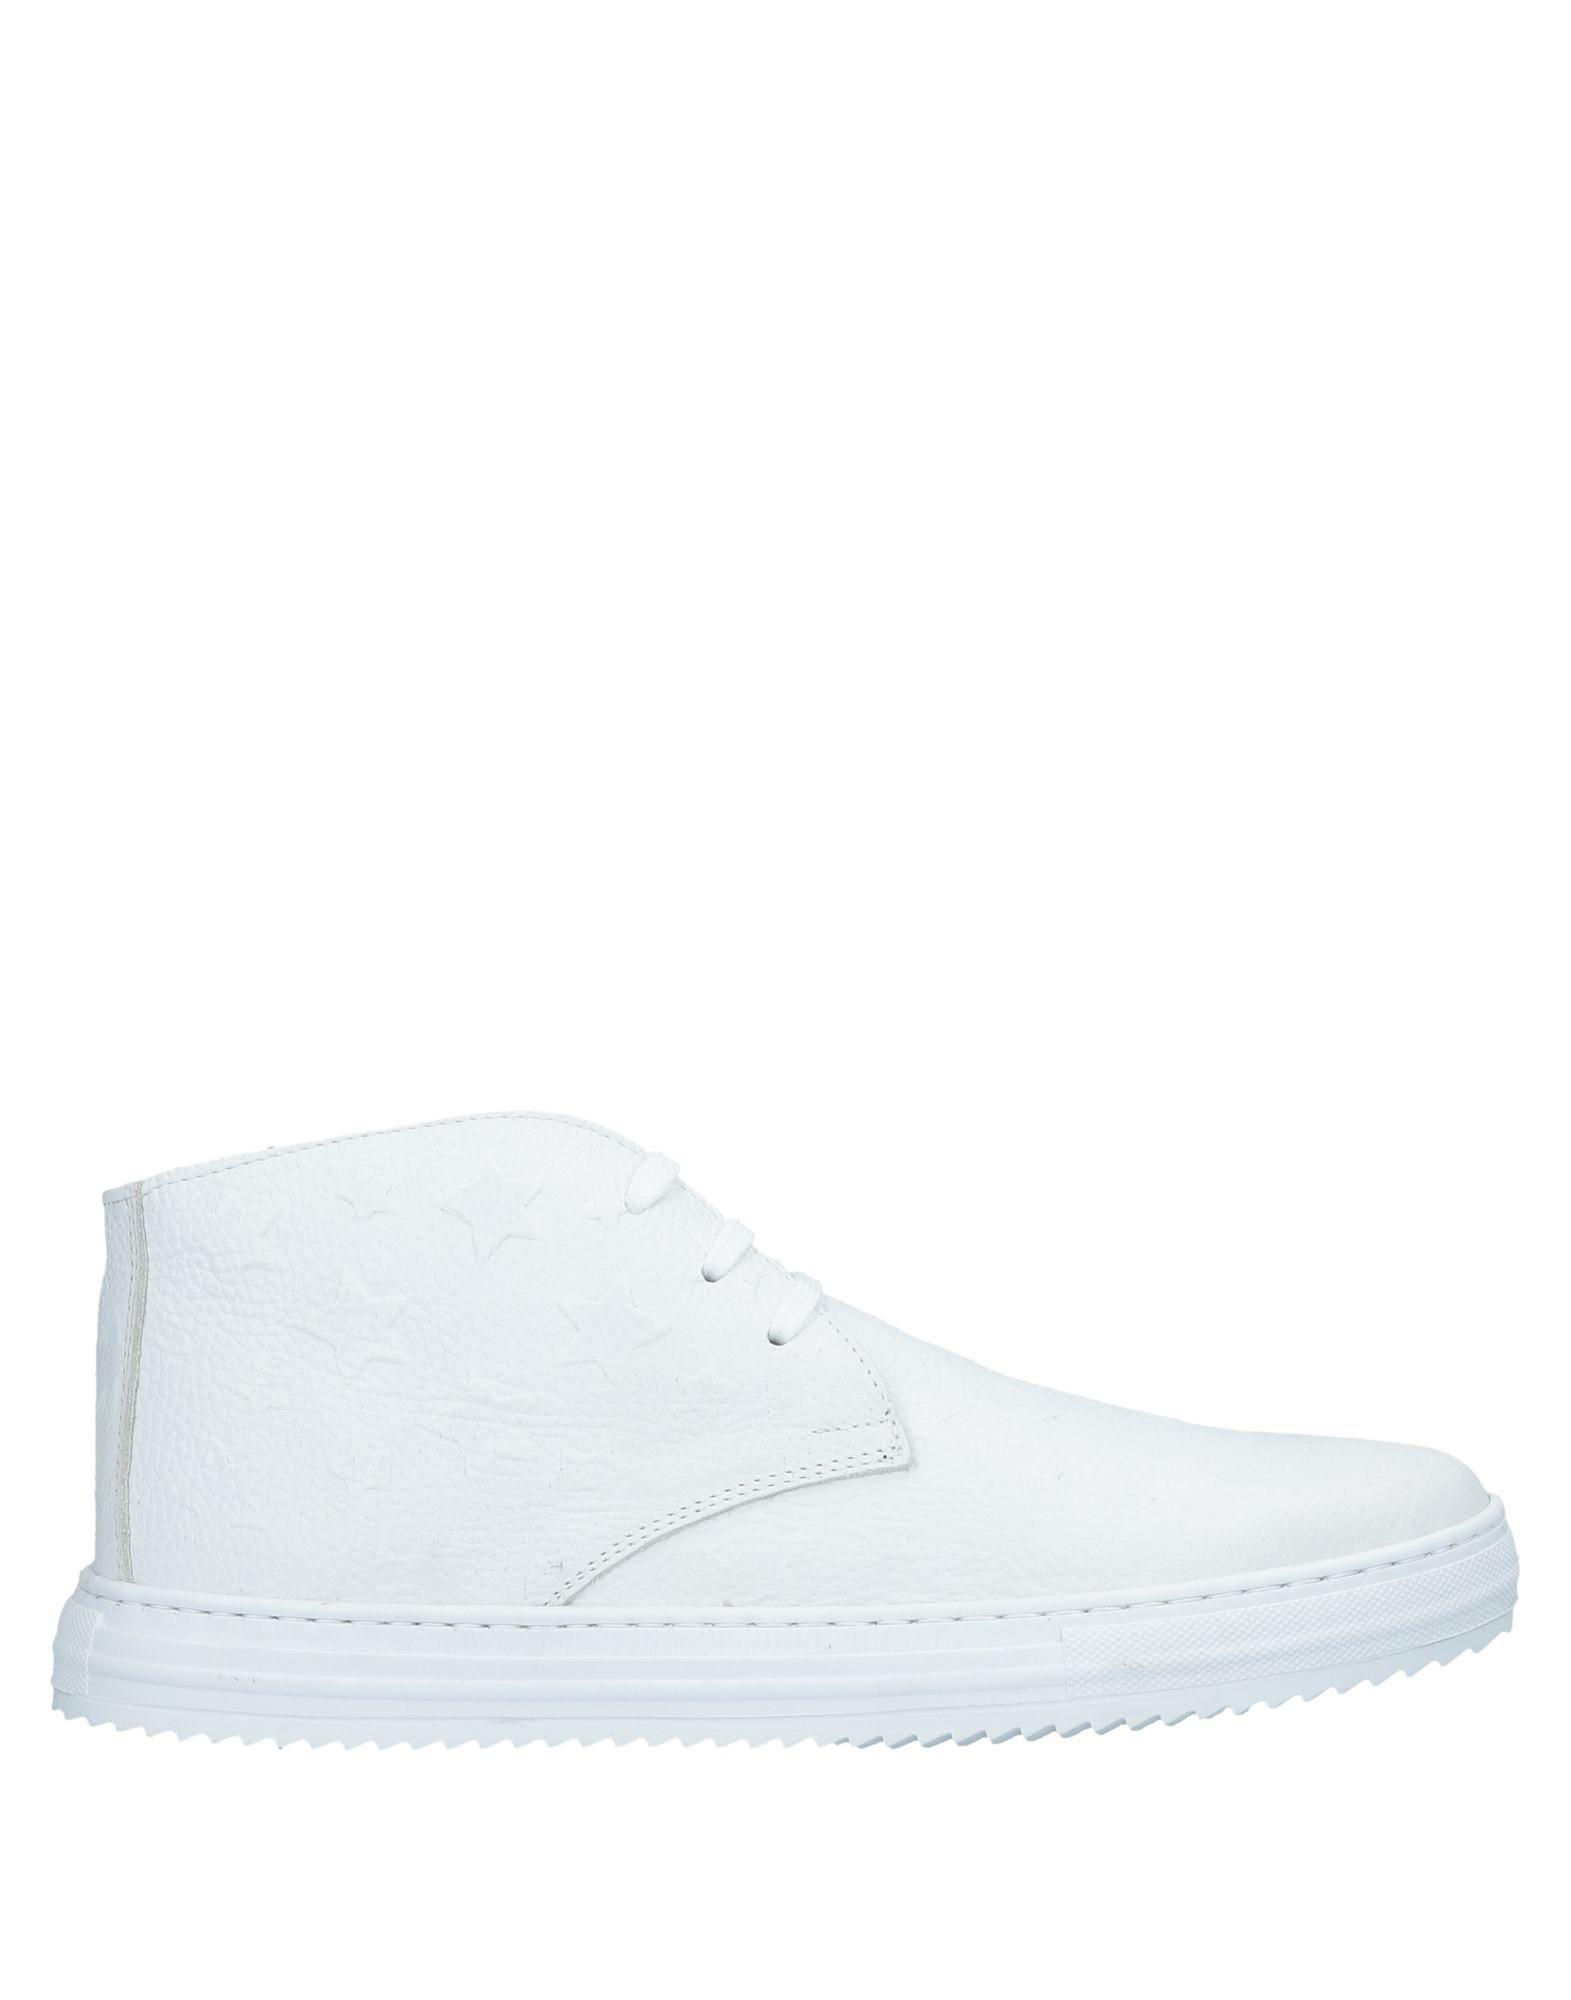 Sneakers Fratelli Circondato Uomo - - Uomo 11521089NS 3ea7aa